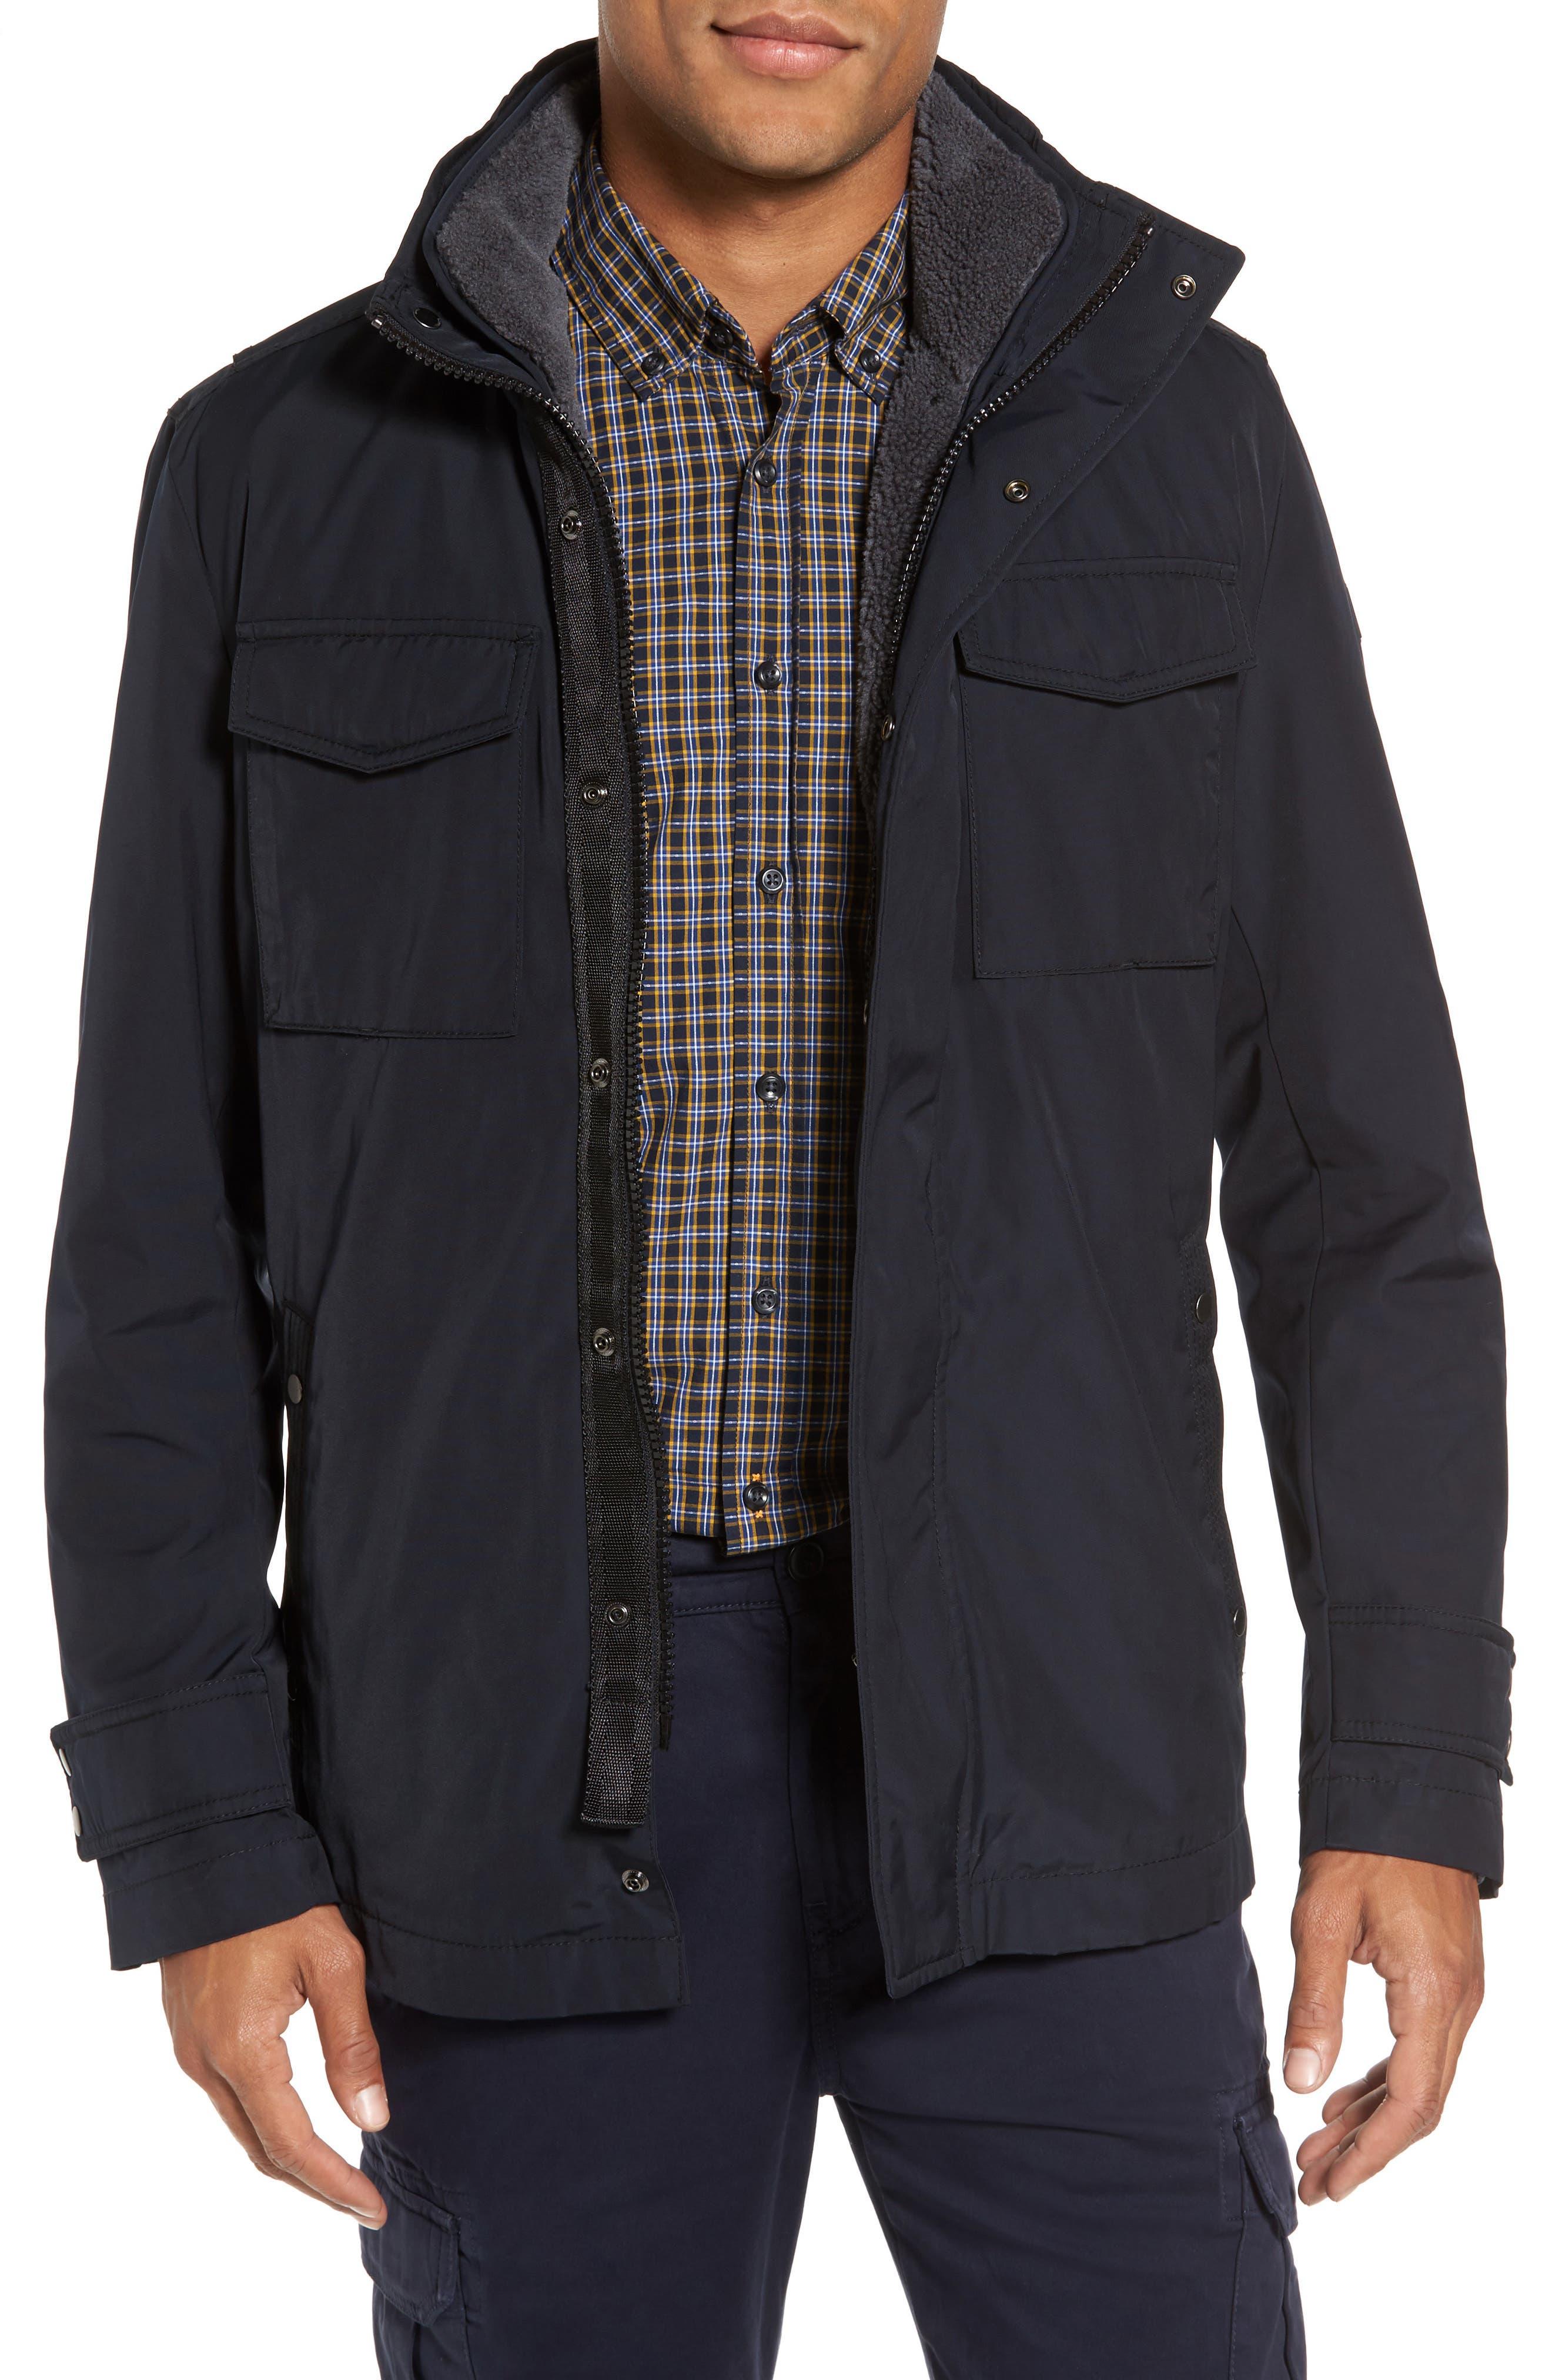 Onick Water Repellent 3-in-1 Field Jacket,                         Main,                         color, 001